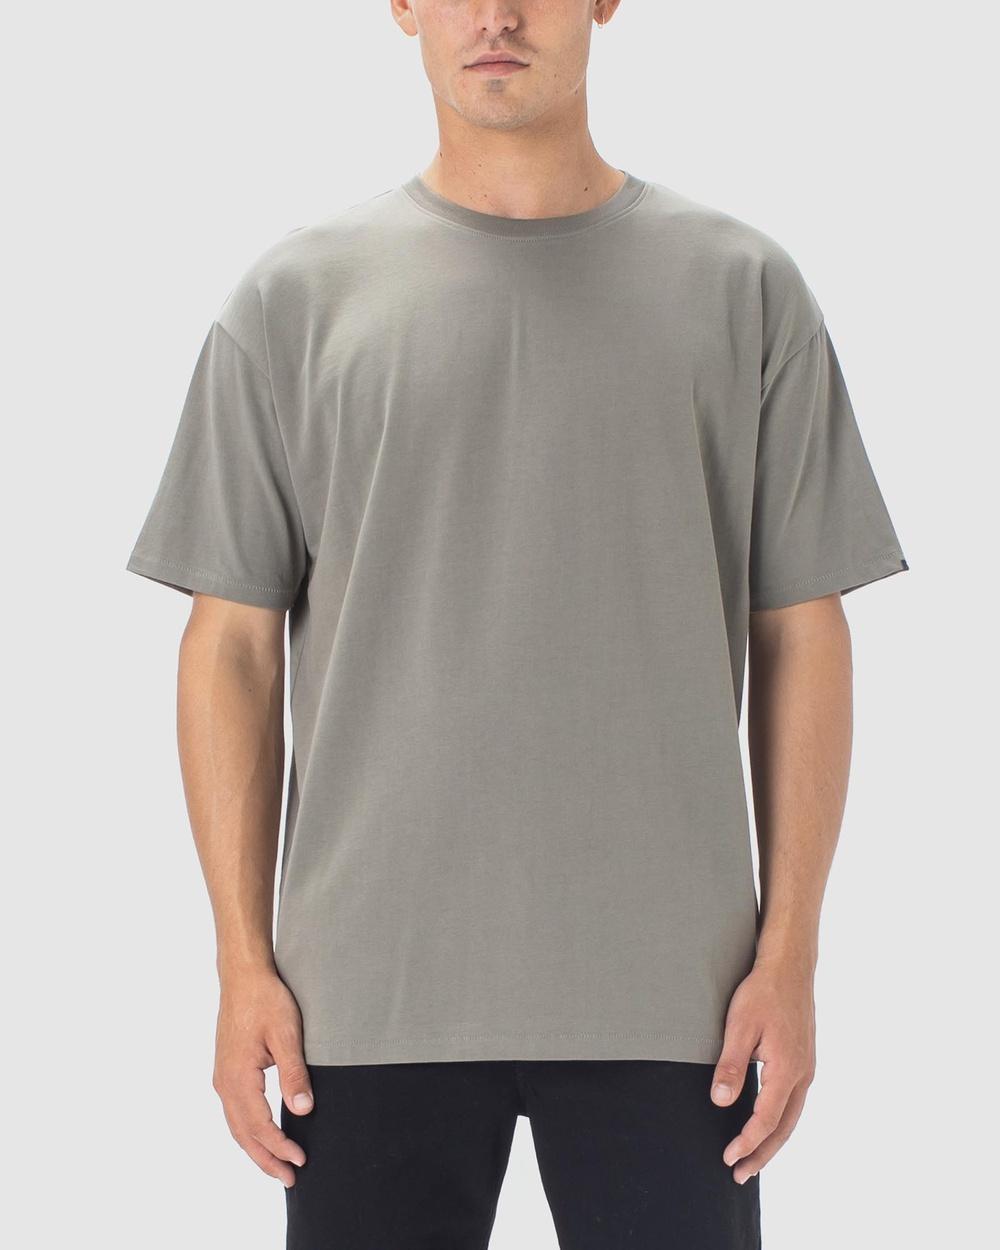 Zanerobe - Box Tee - T-Shirts & Singlets (Dark Moss) Box Tee